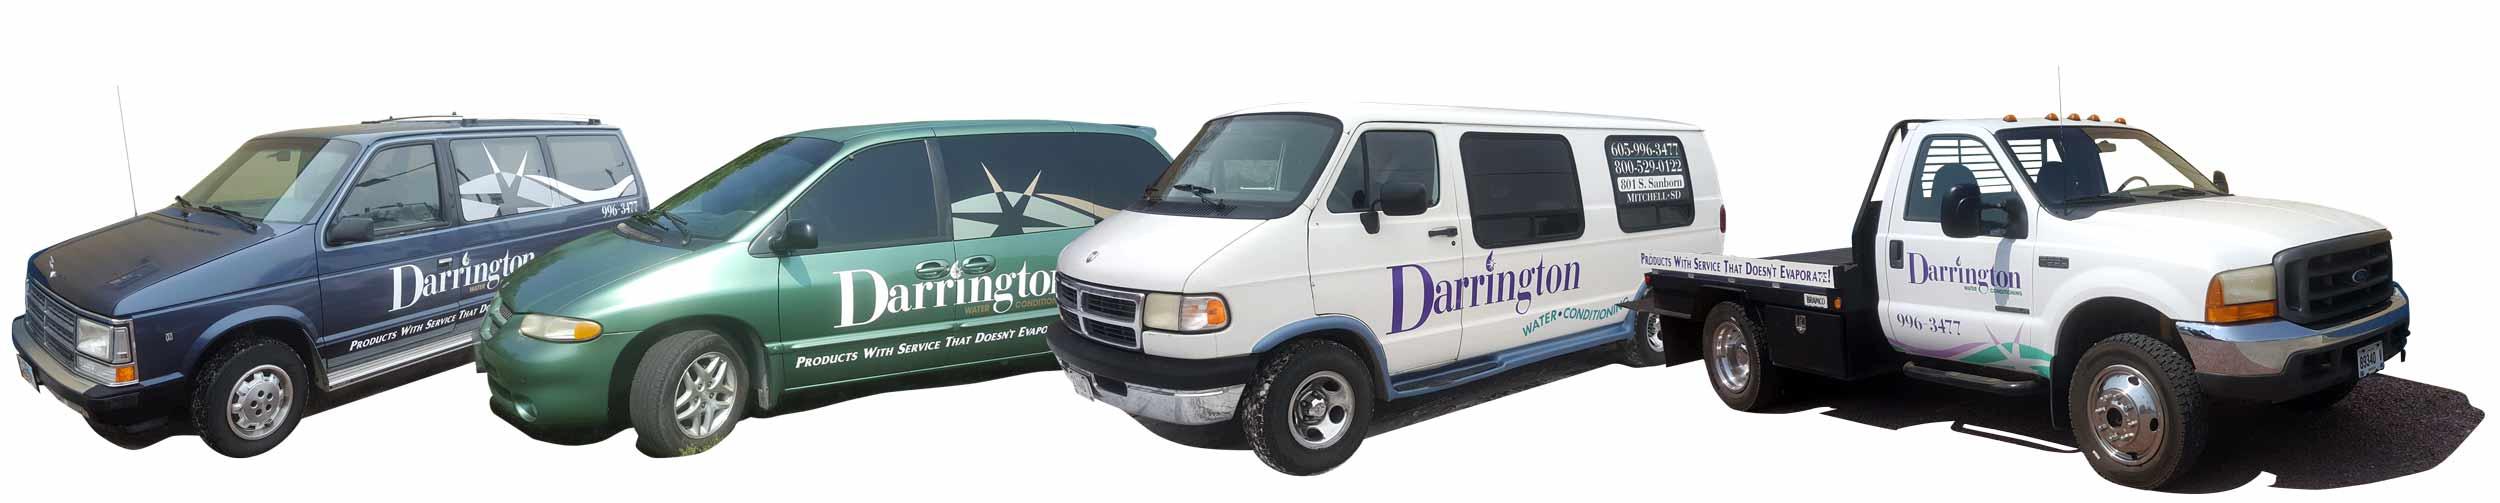 Darrington Vehicles